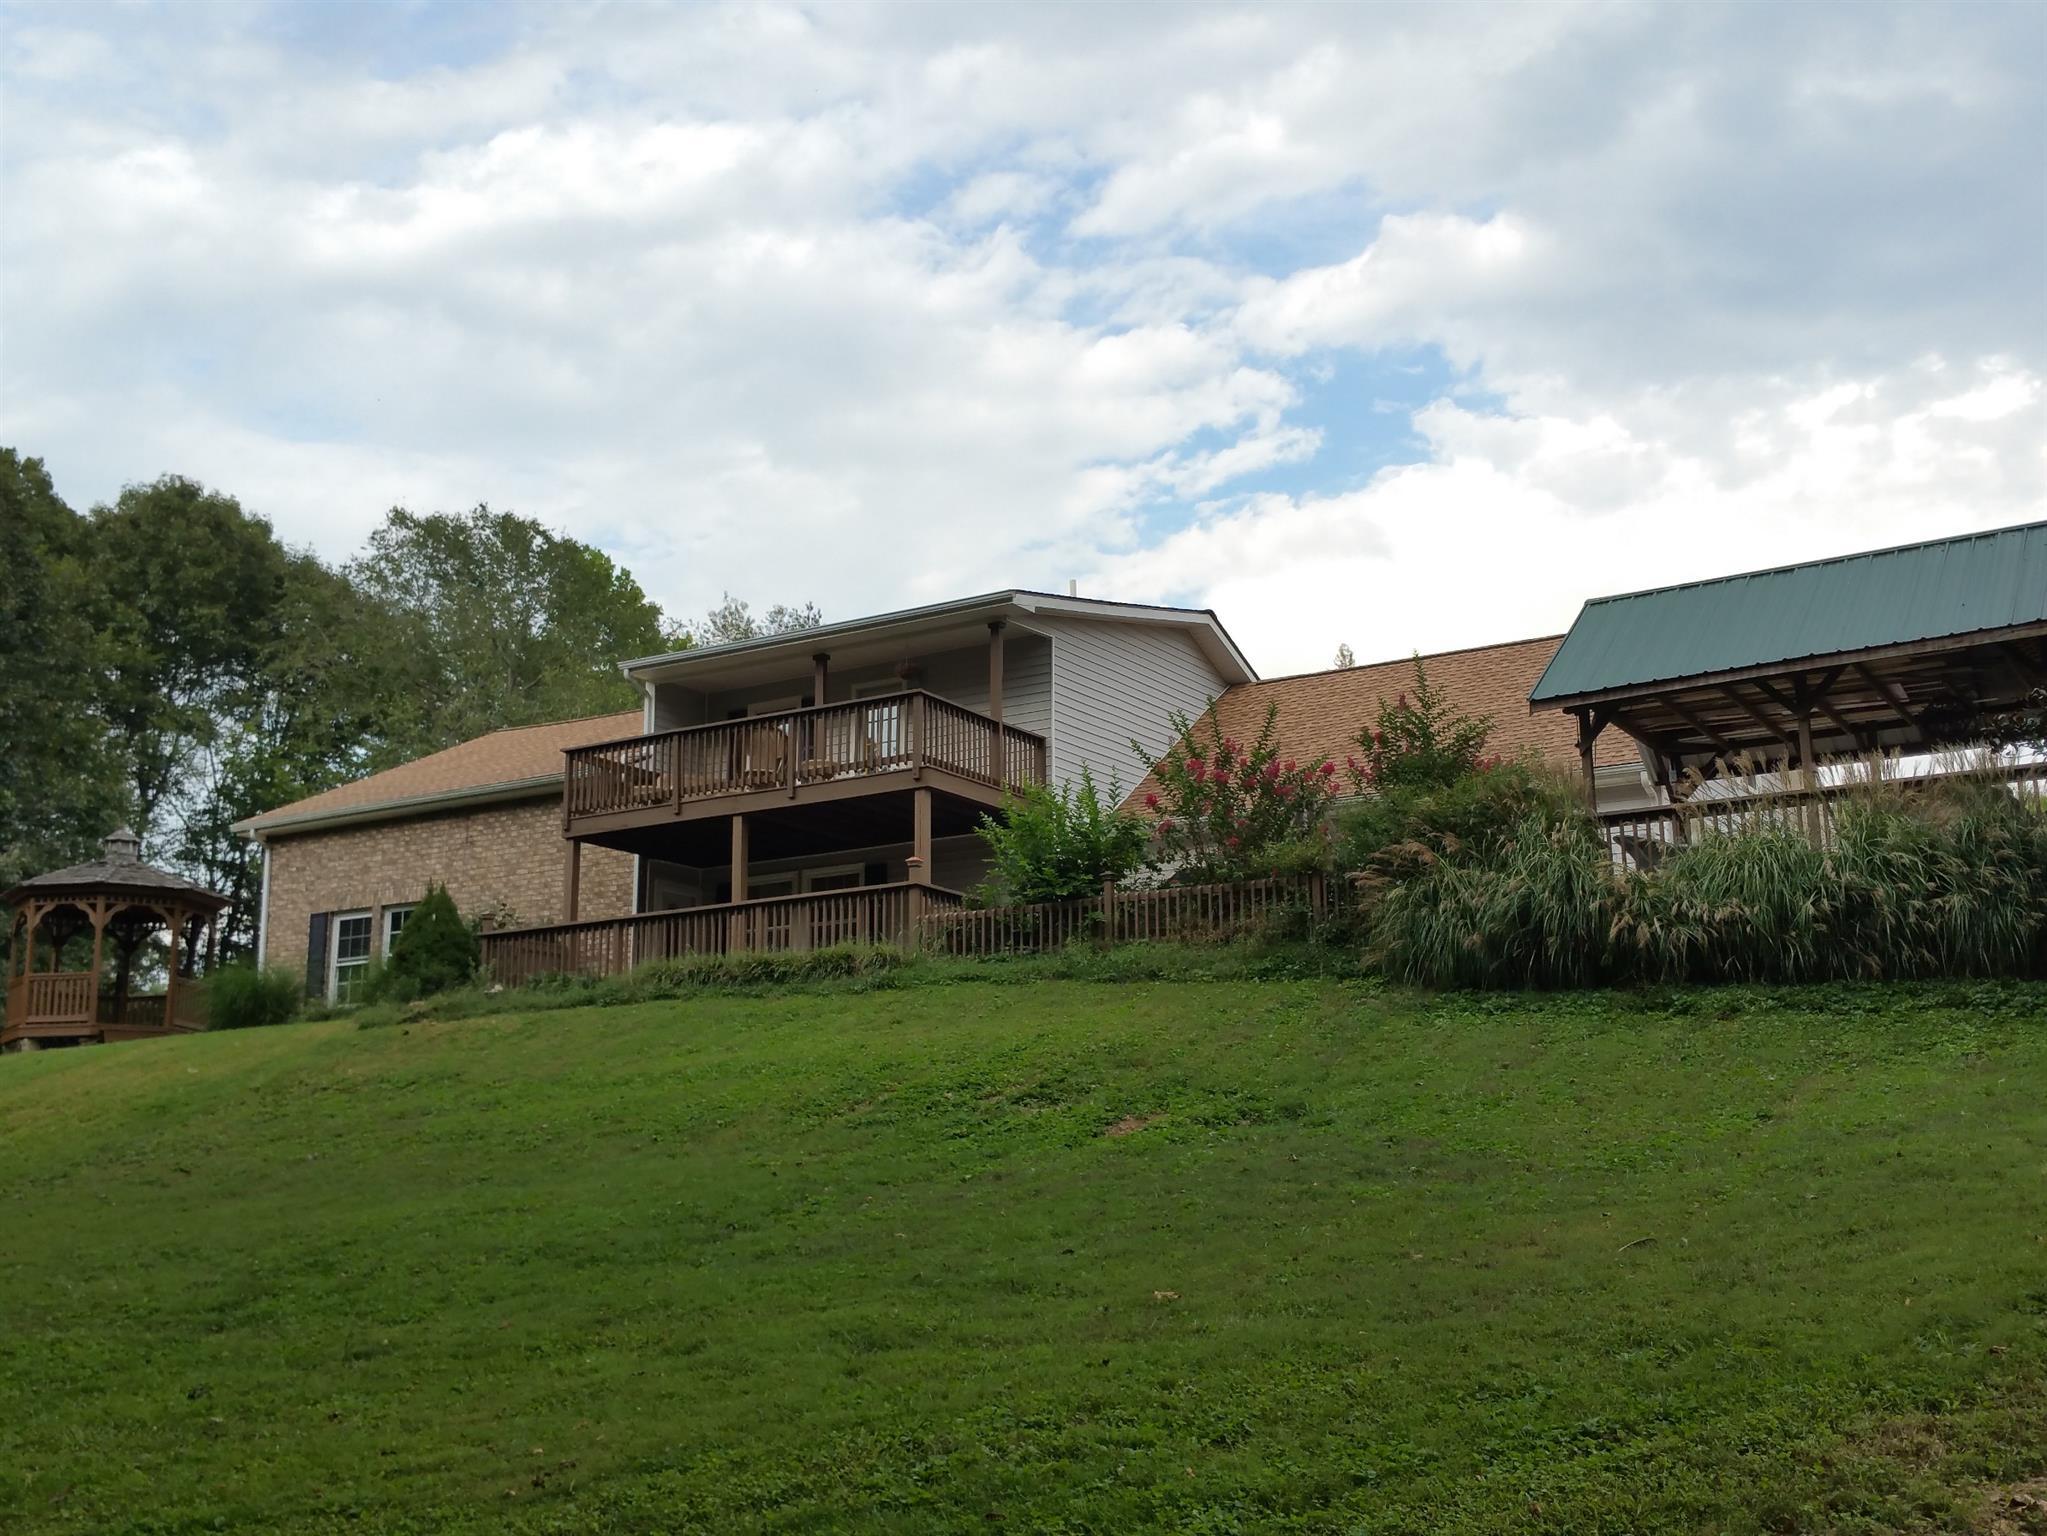 1935 Mcmahan Hollow Rd, Pleasant View, TN 37146